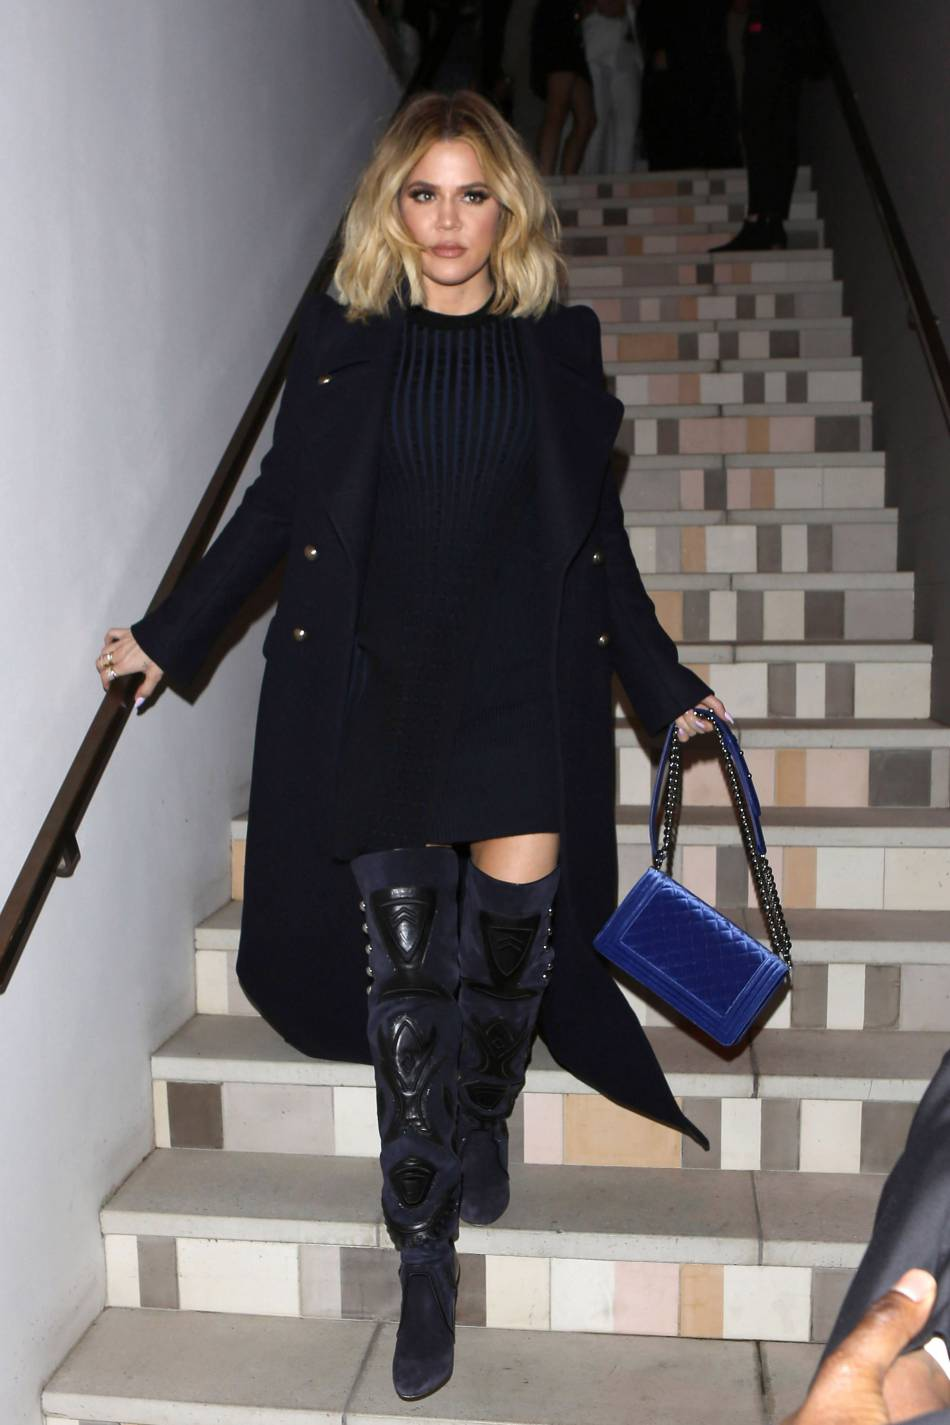 Khloe Kardashian canon dans son body moulant, elle arbore sa poitrine pulpeuse.